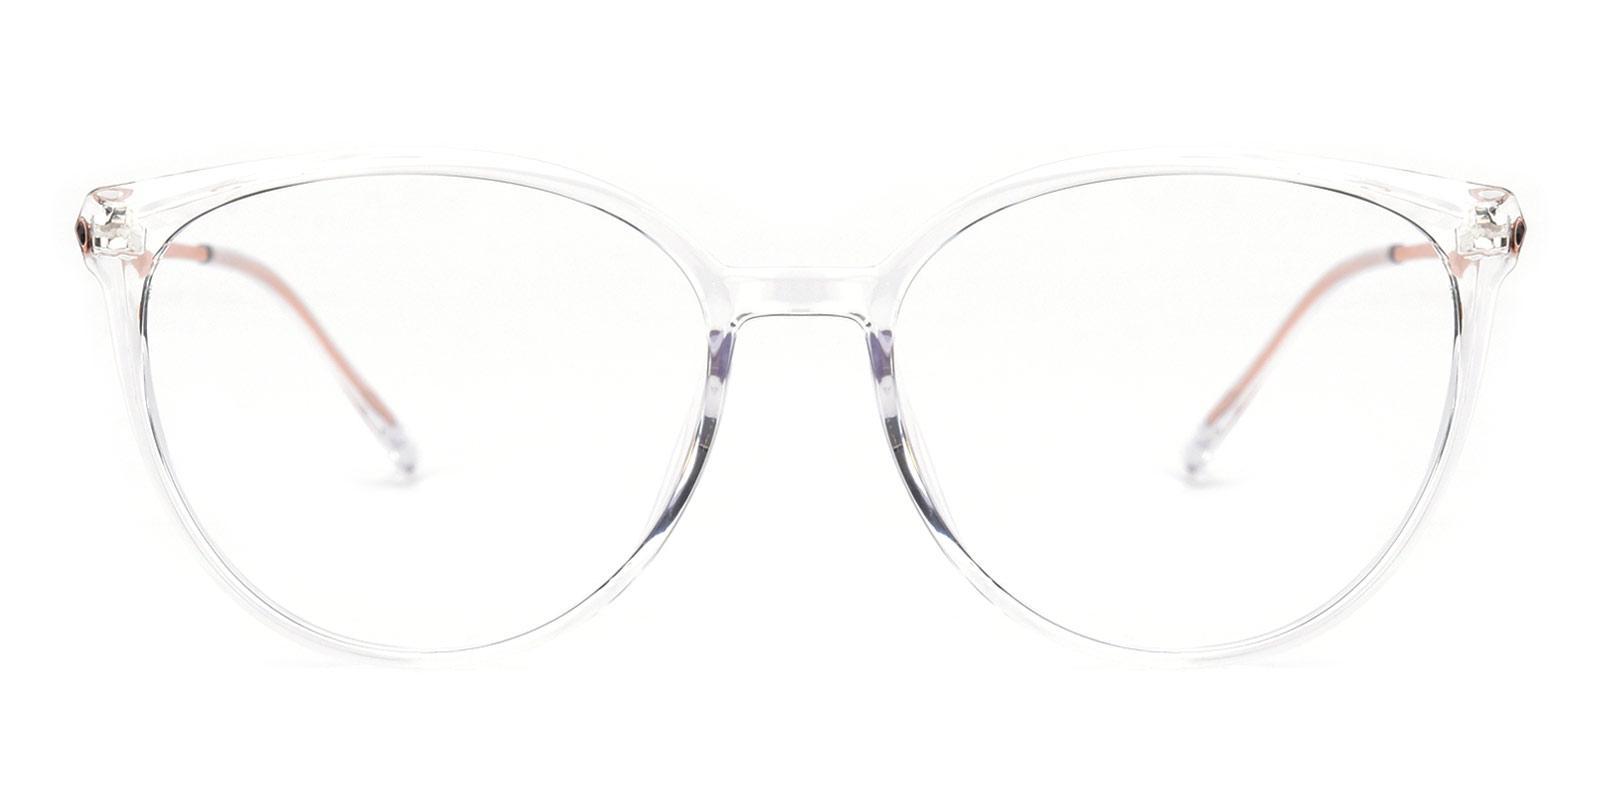 Glamour-Translucent-Cat / Round-TR-Eyeglasses-detail